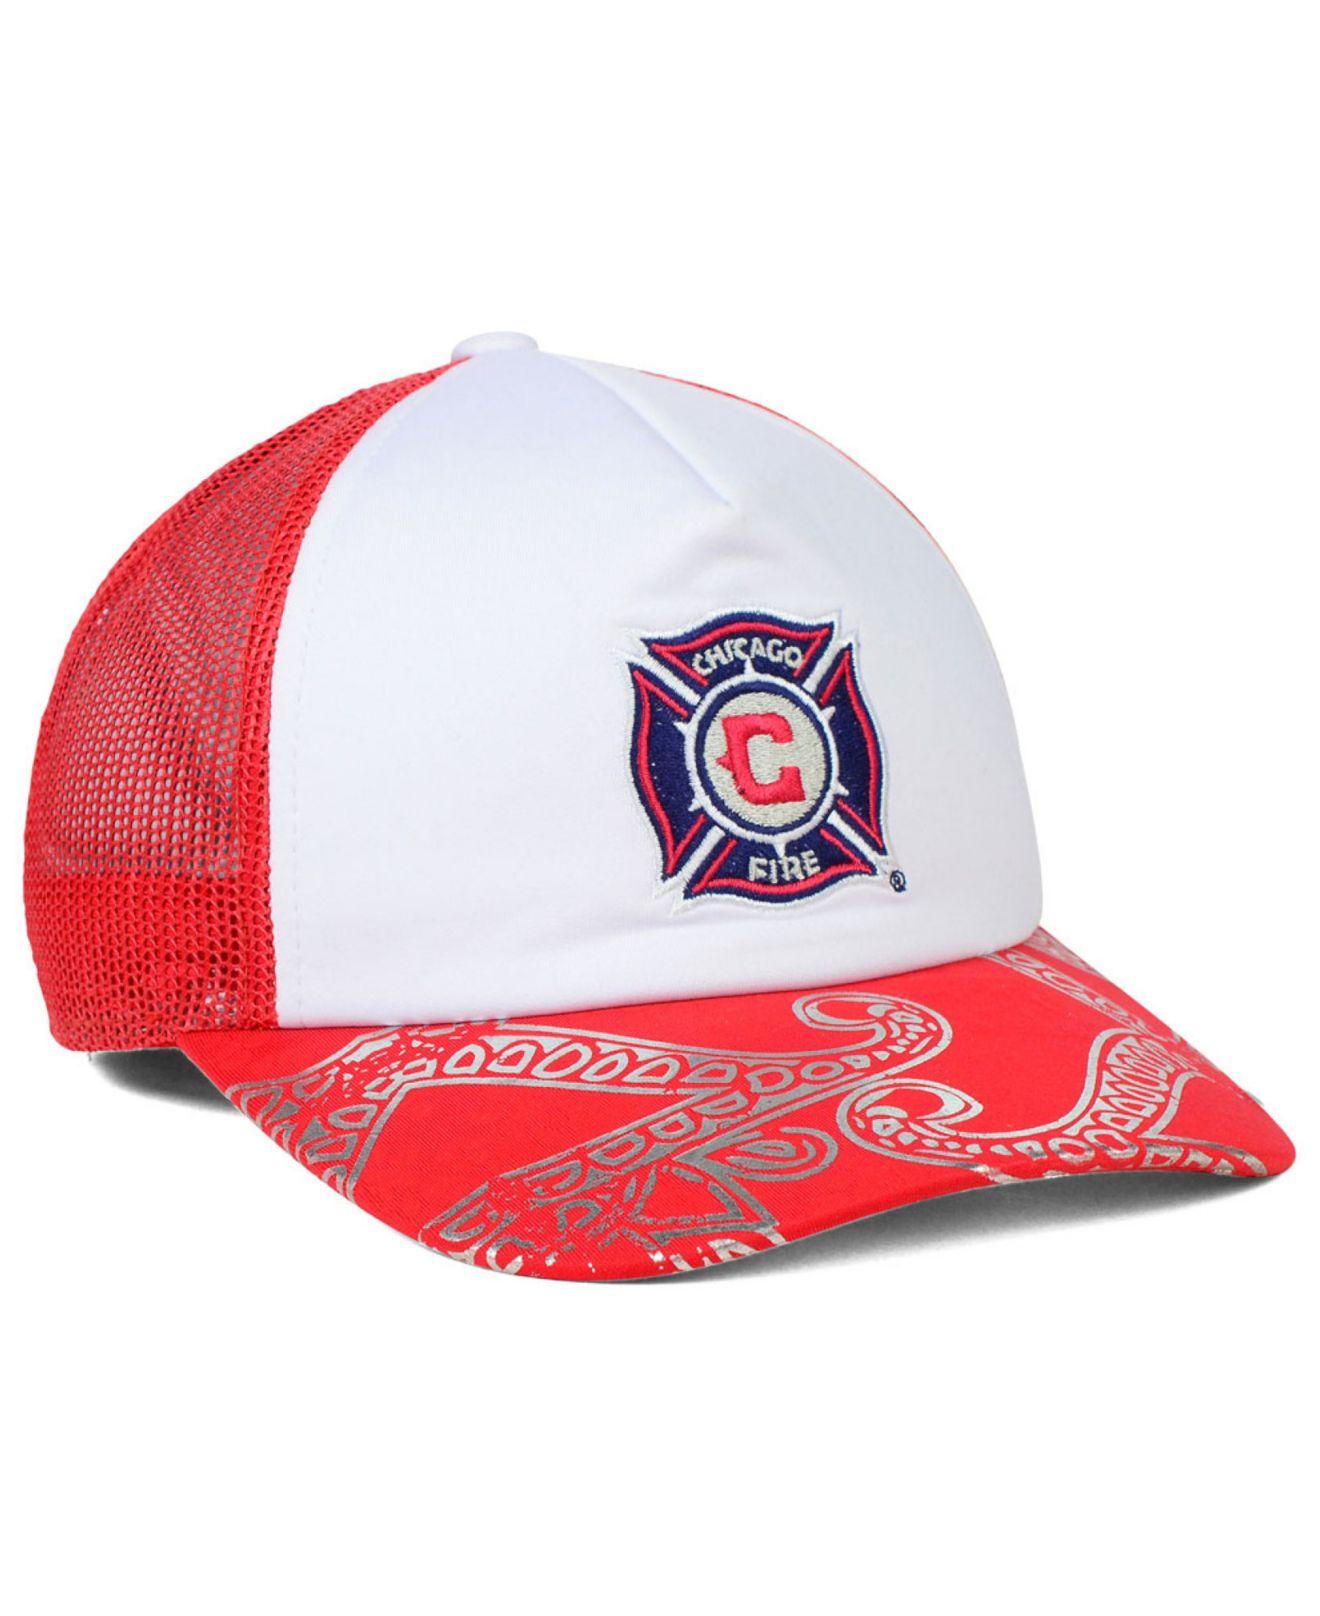 99b262c0 KTZ Red Adidas Women's Chicago Fire Trucker Cap